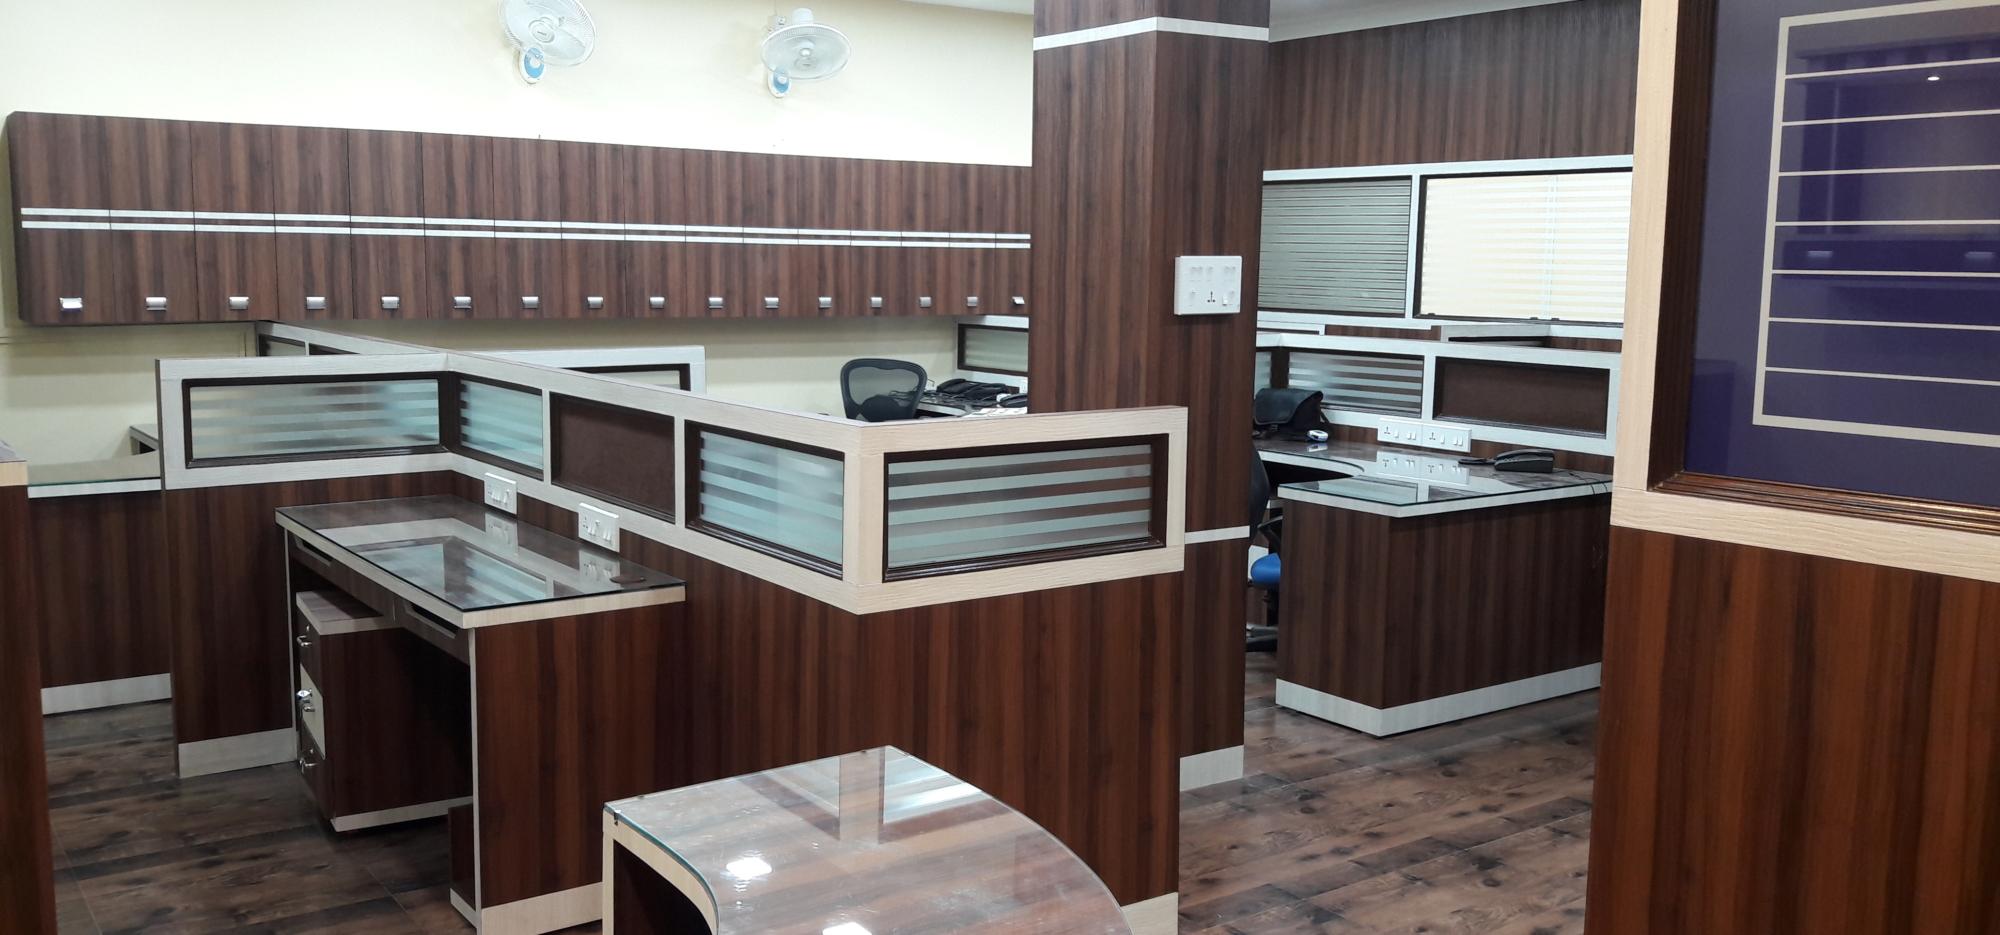 Bower In Decor Interior Designer Kolkata India